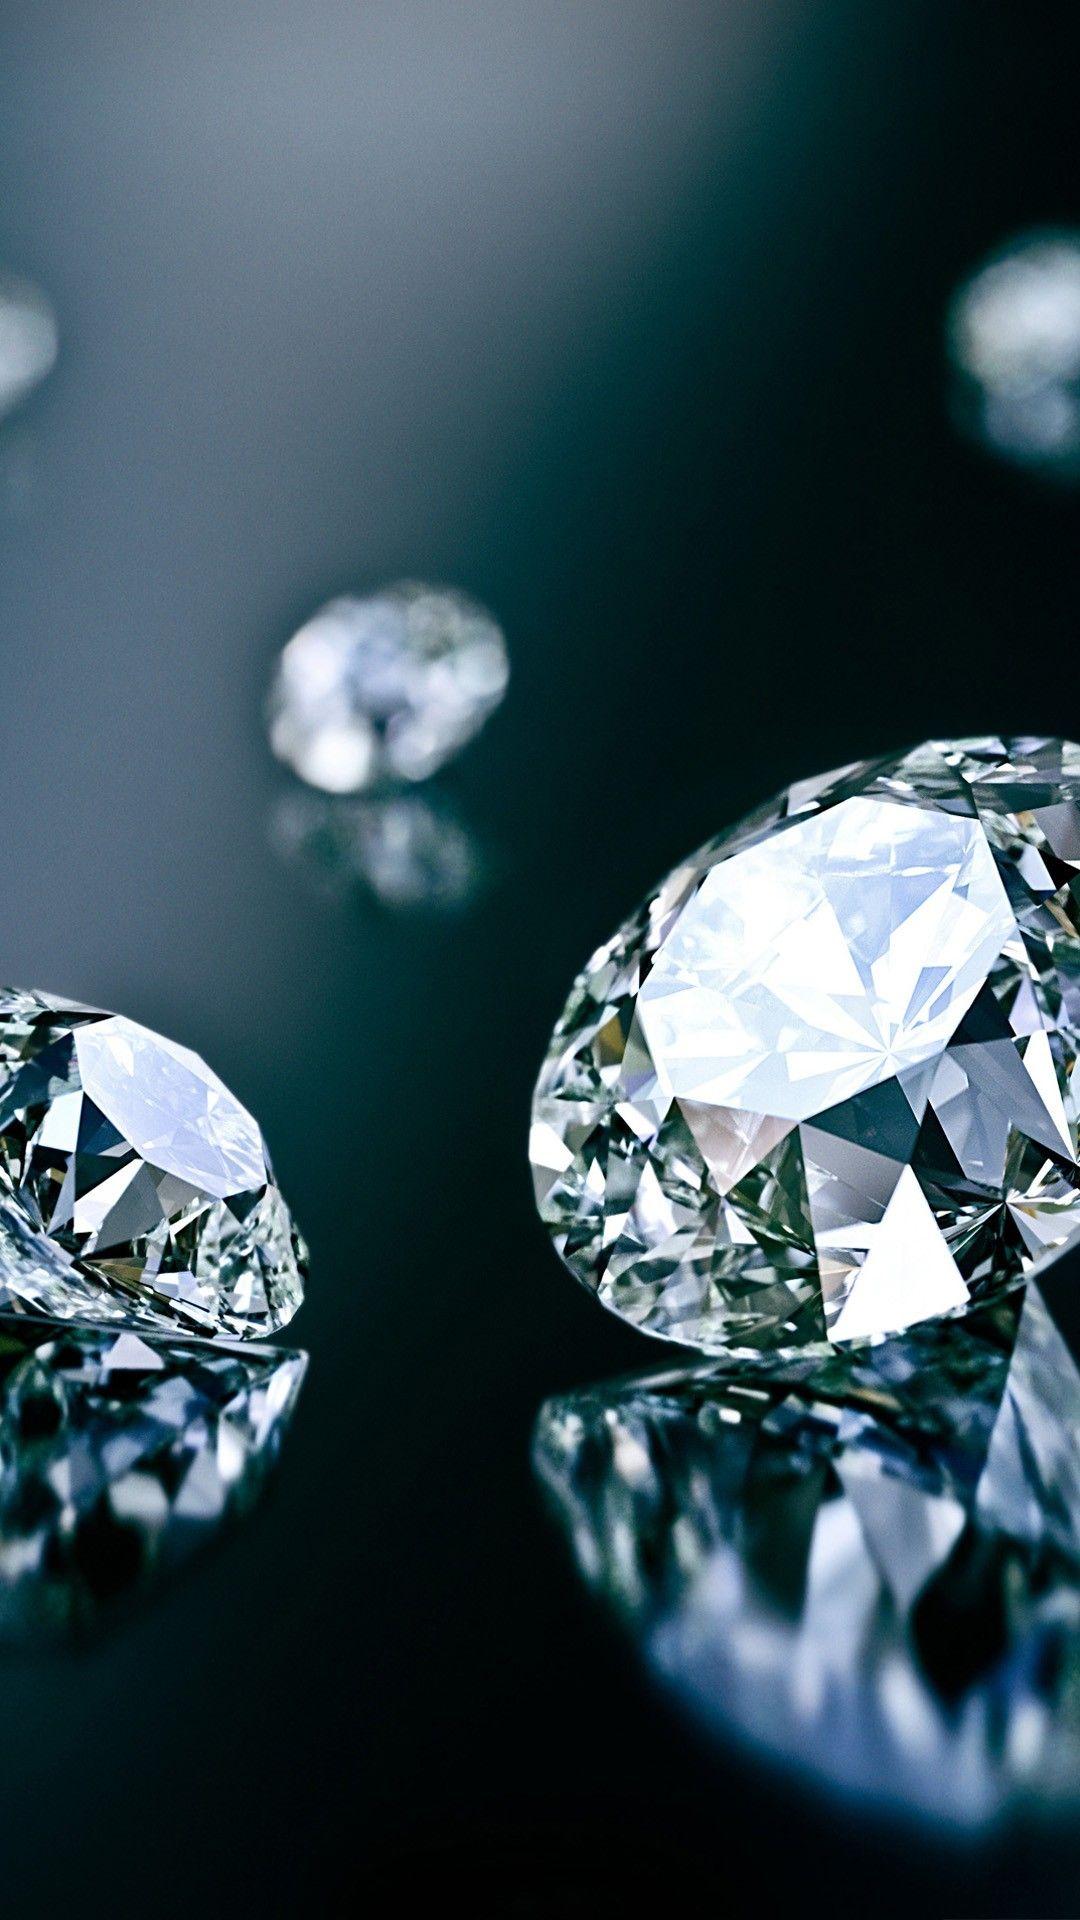 Diamond Accessories 2014041142 Samsung Hd Wallpapers Diamond Wallpaper Iphone Diamond Picture Samsung Wallpaper